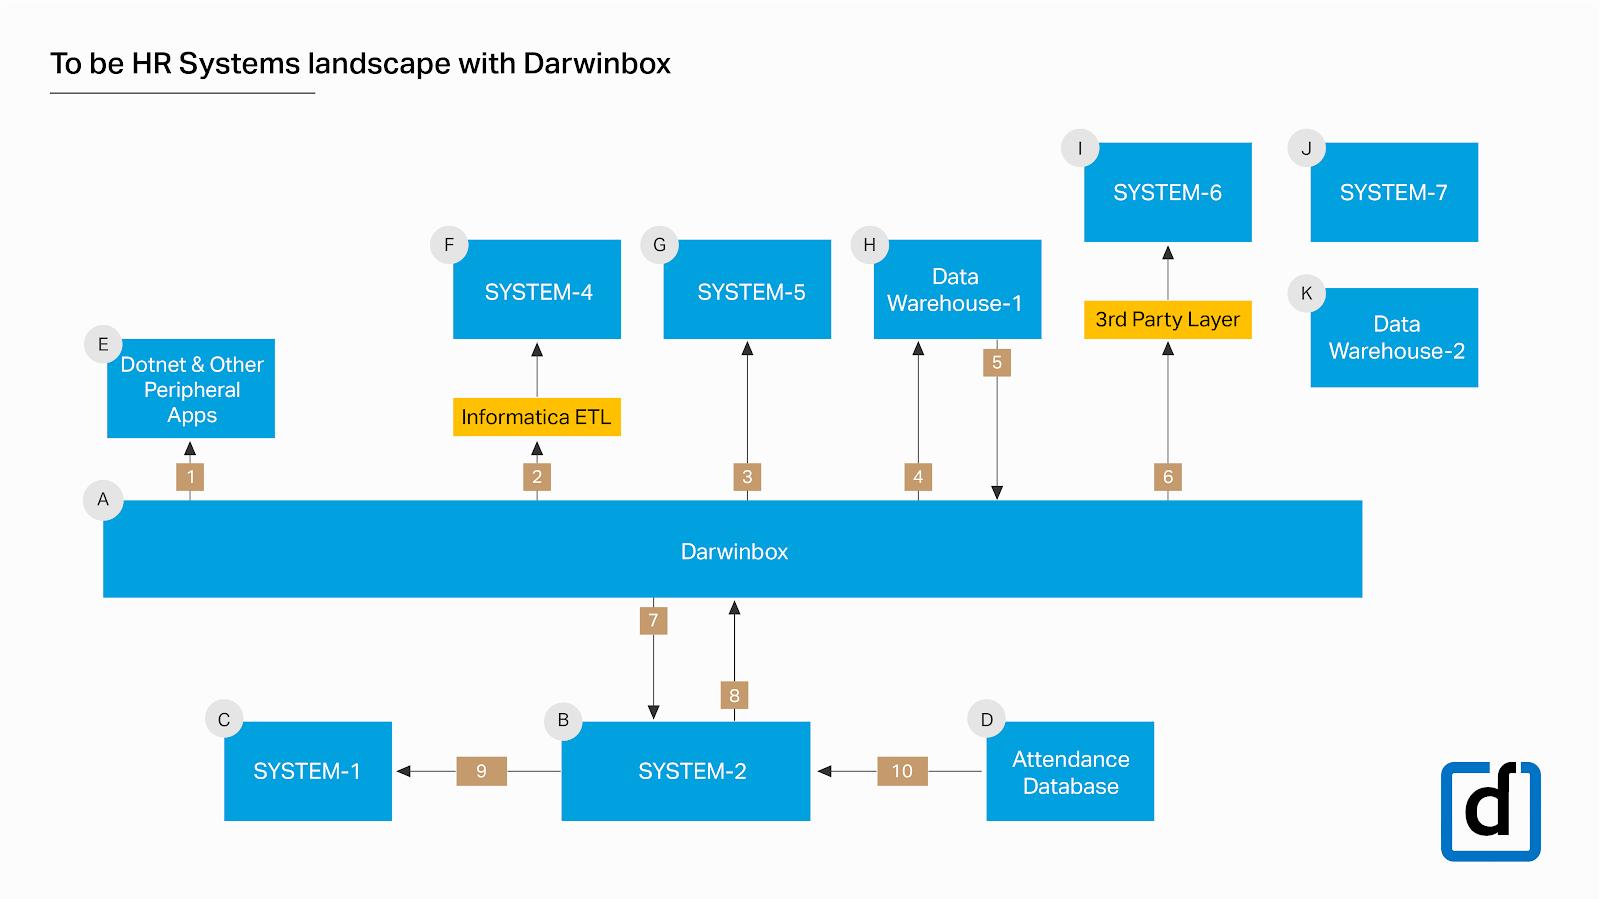 hr-system-landscape-darwinbox